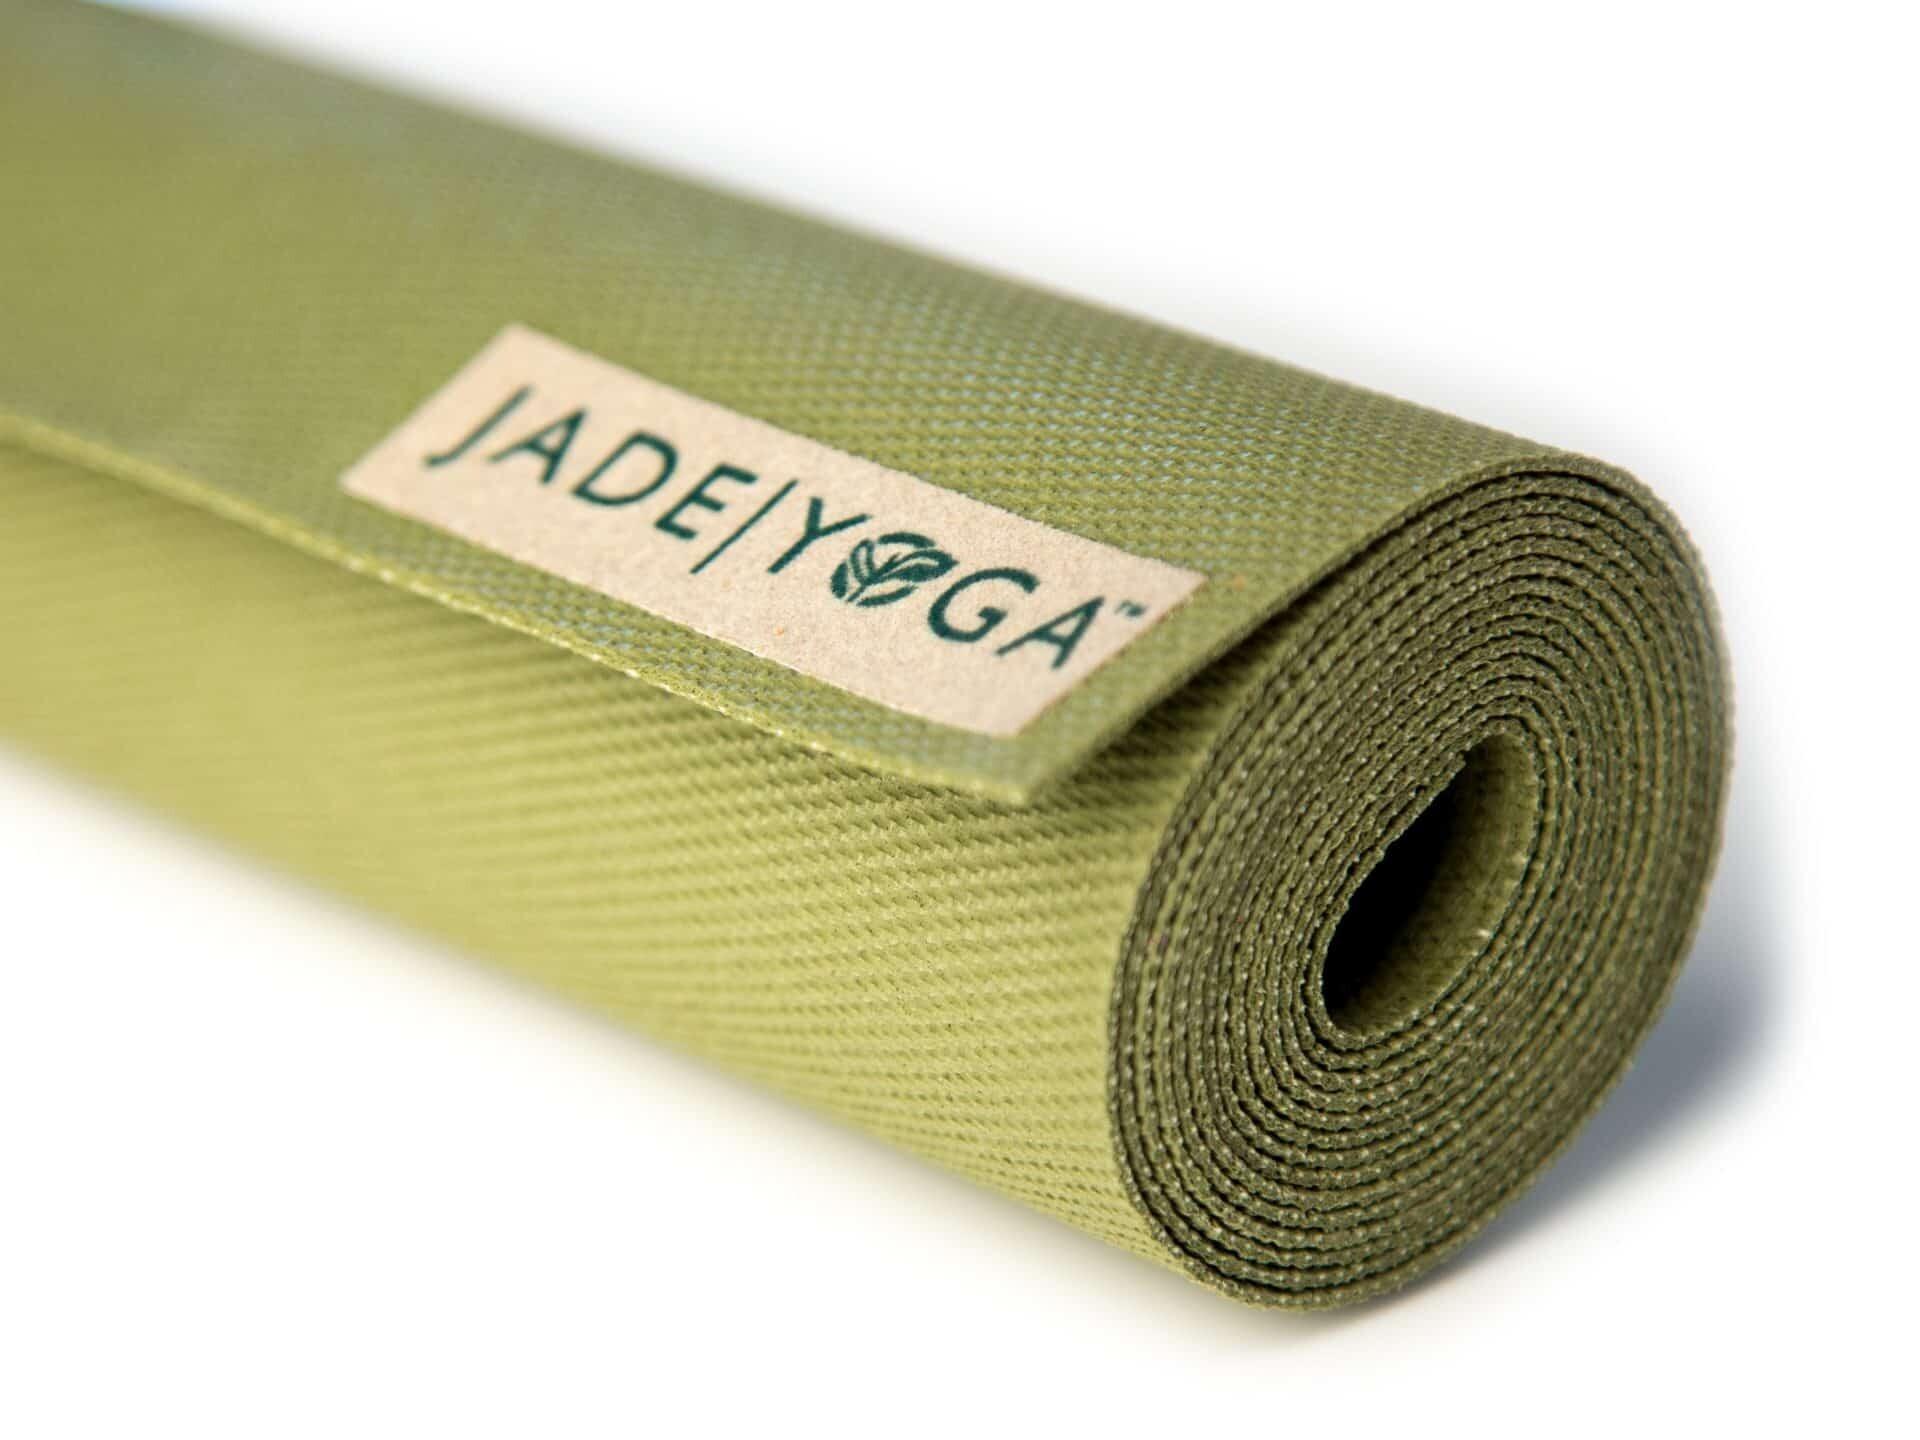 Jade Voyager travel Yoga Mat